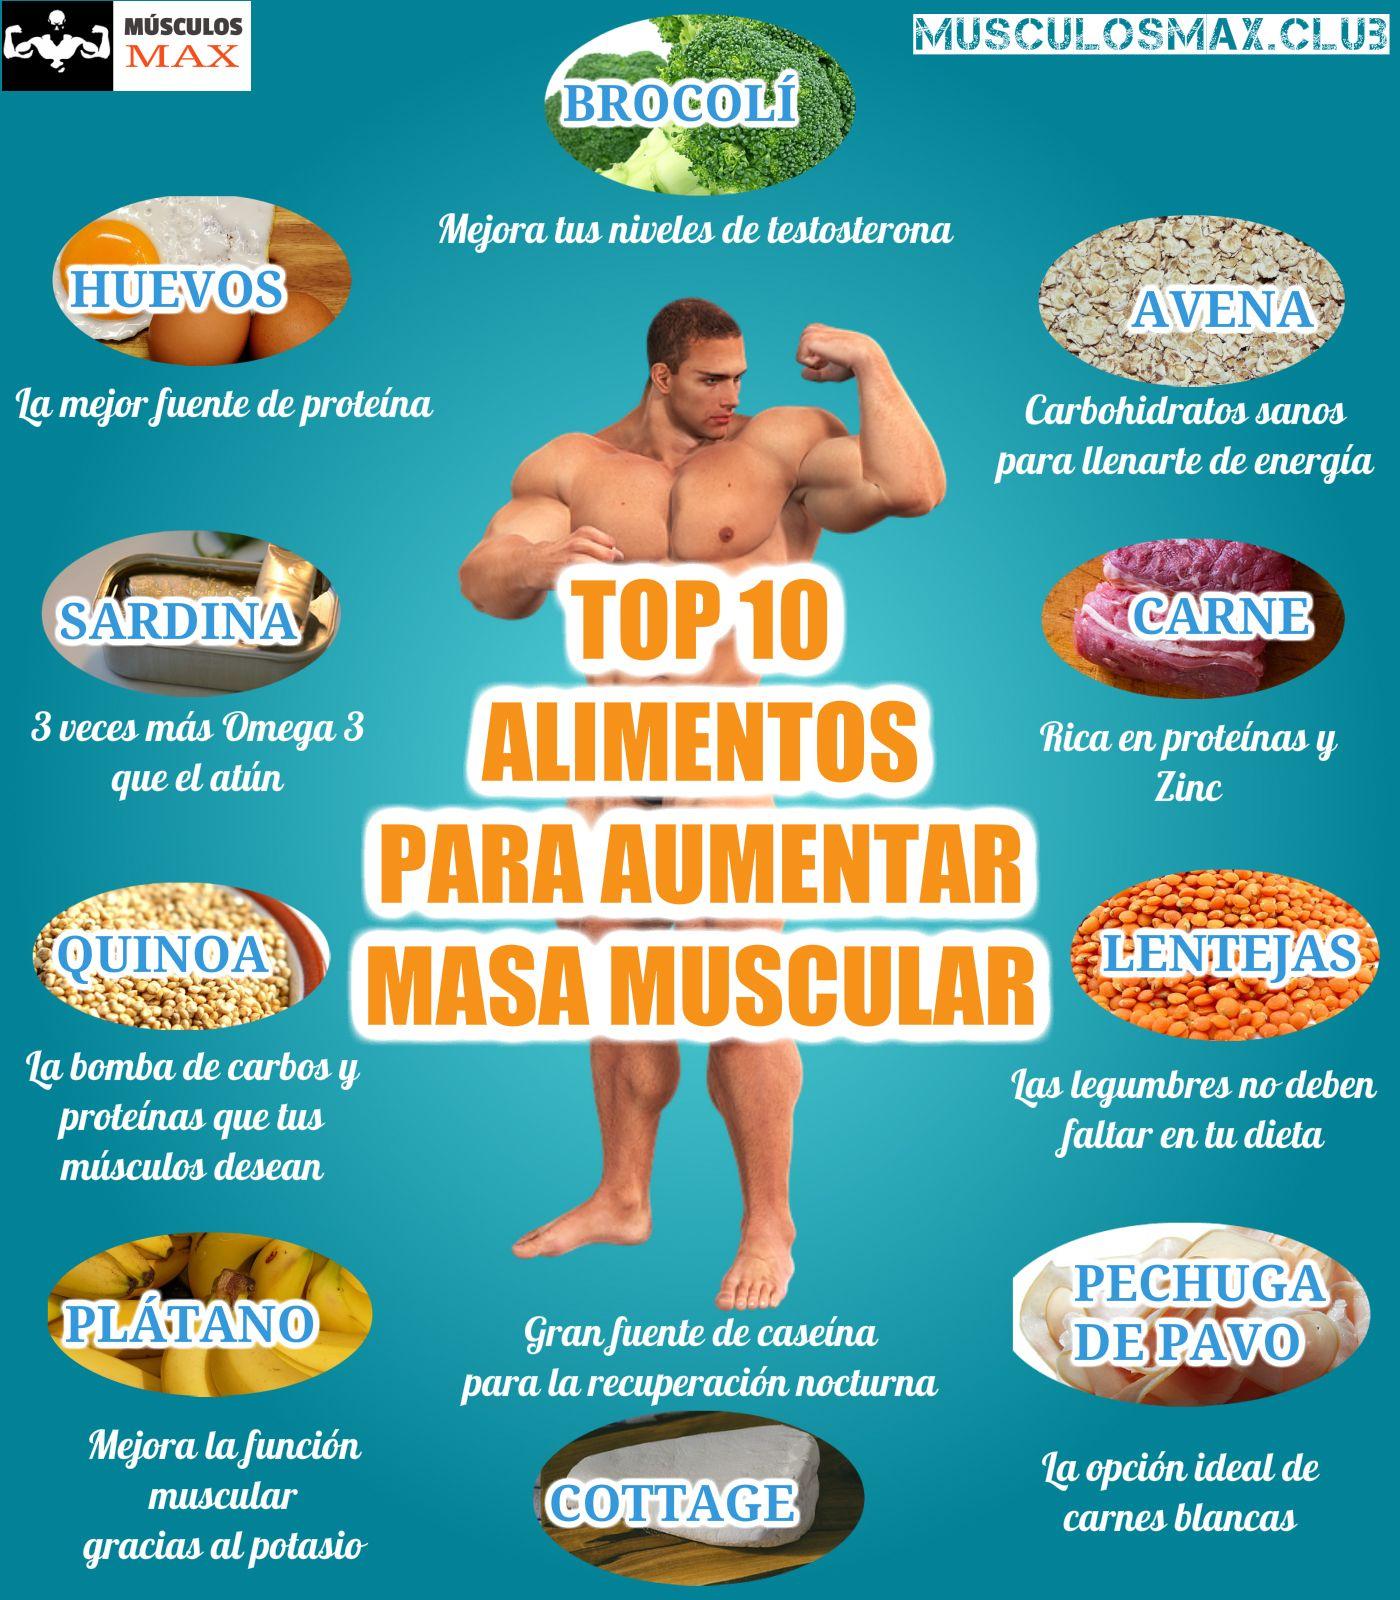 carbohidratos saludables para ganar masa muscular